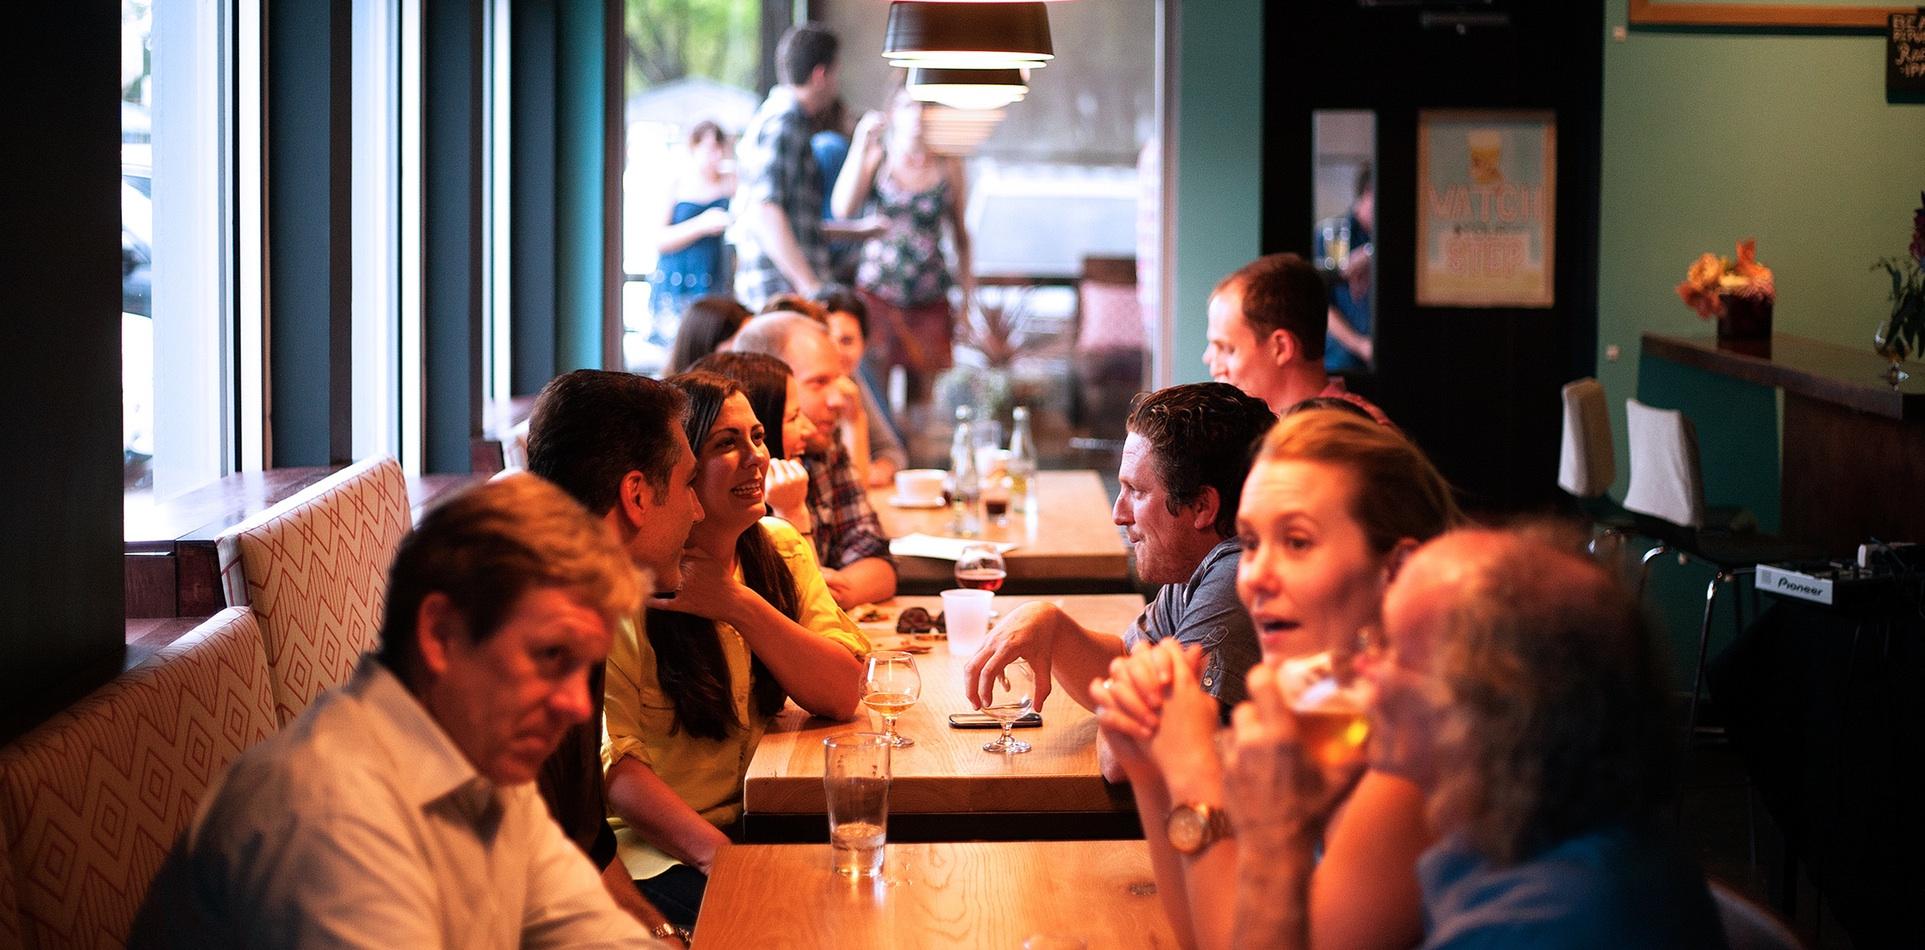 la sobremesa - Crema Catalana - blog over reizen, beleven, eten en logeren in Spanje